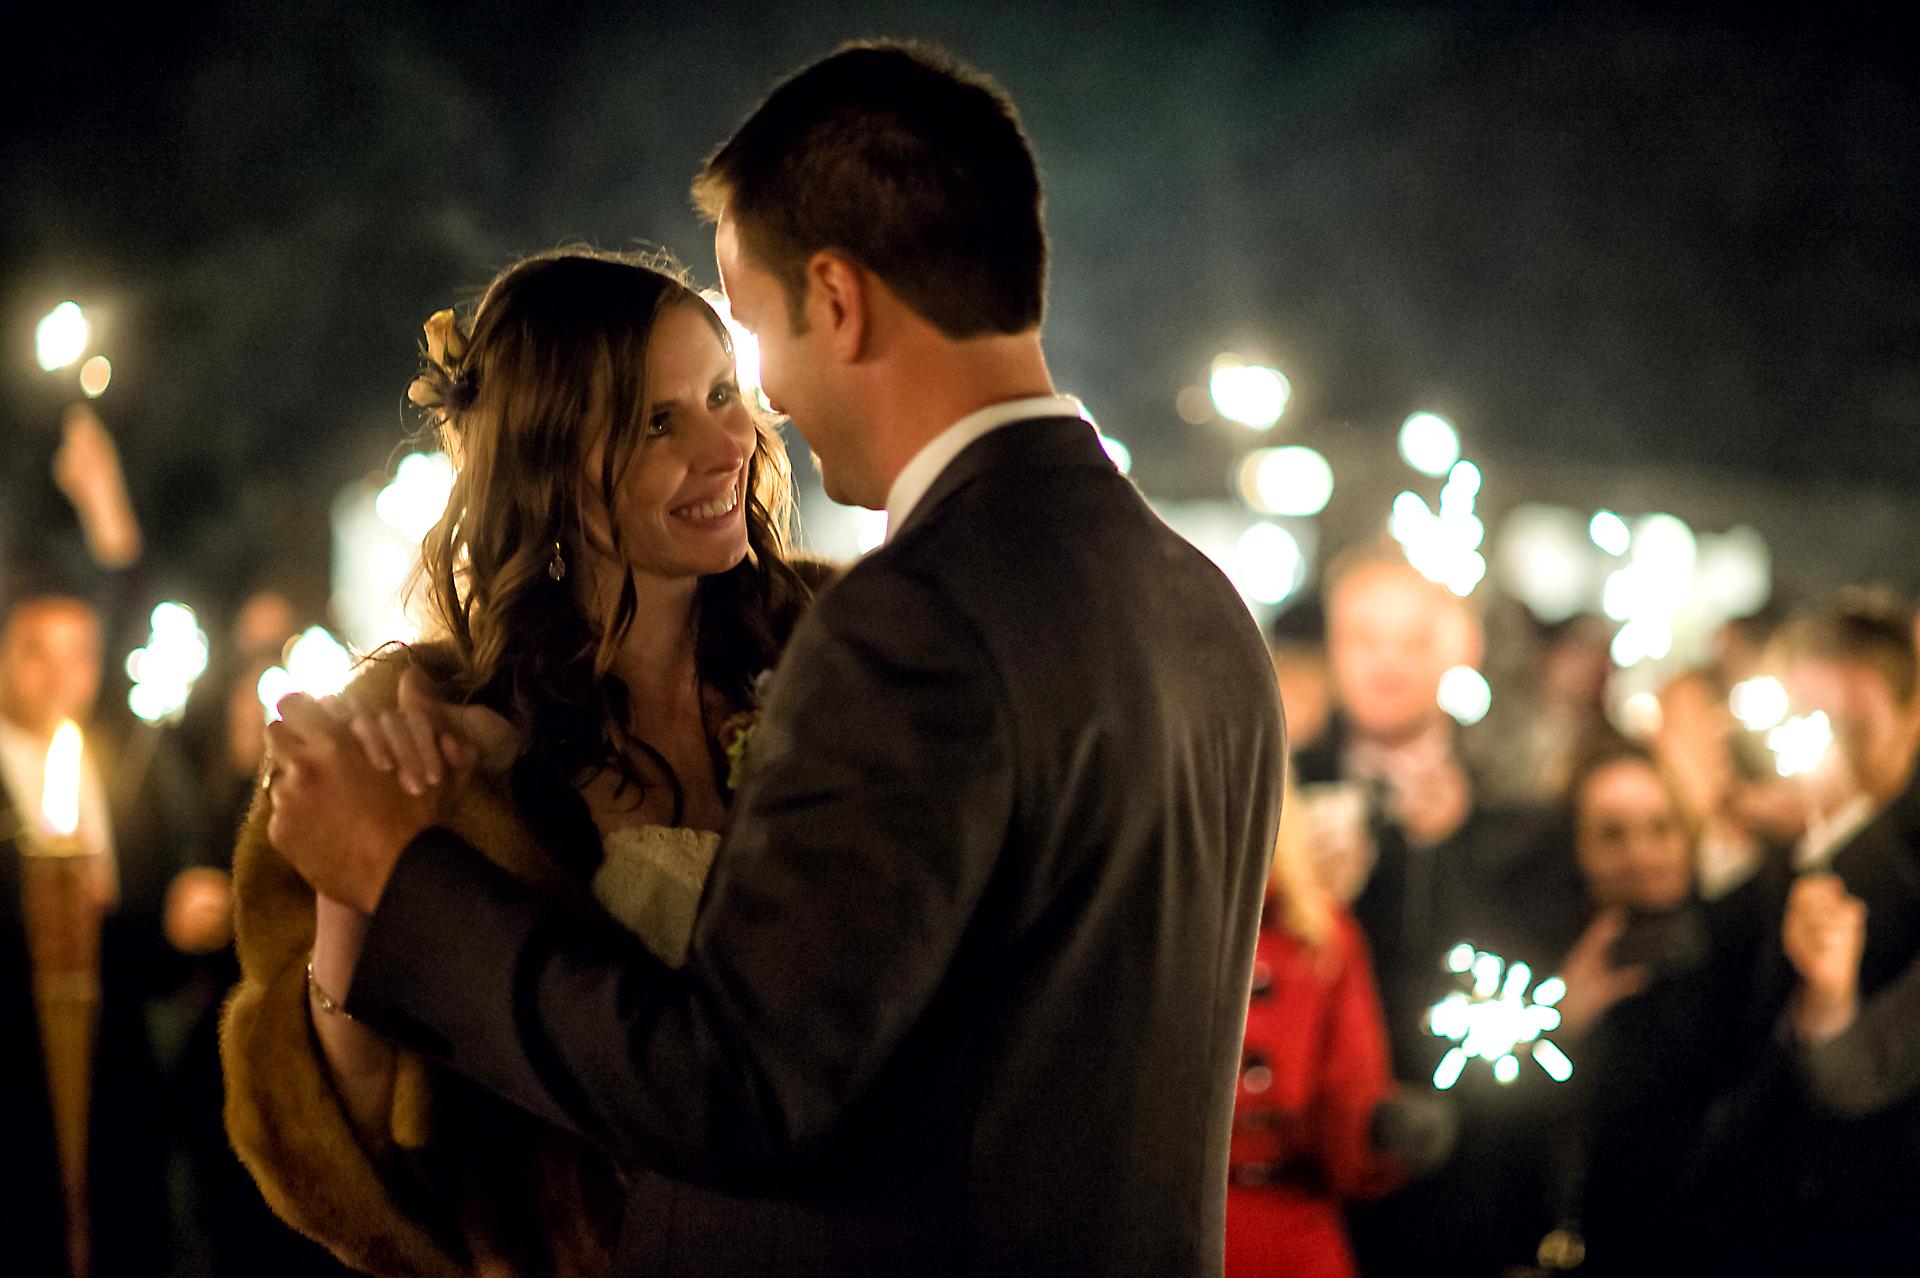 Nathan & Linda | Brooksfield Farms Wedding | Muskoka Wedding Photography37